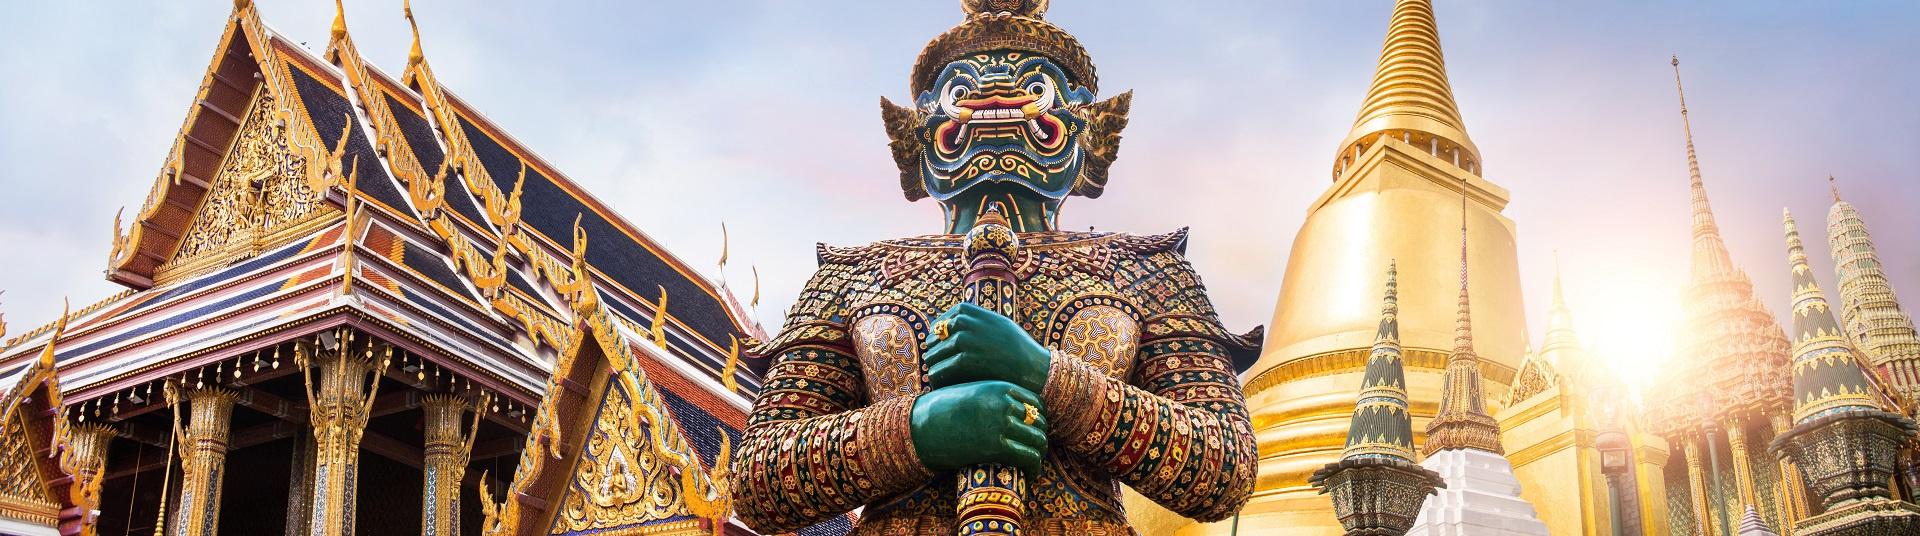 Week-end pas cher Bangkok